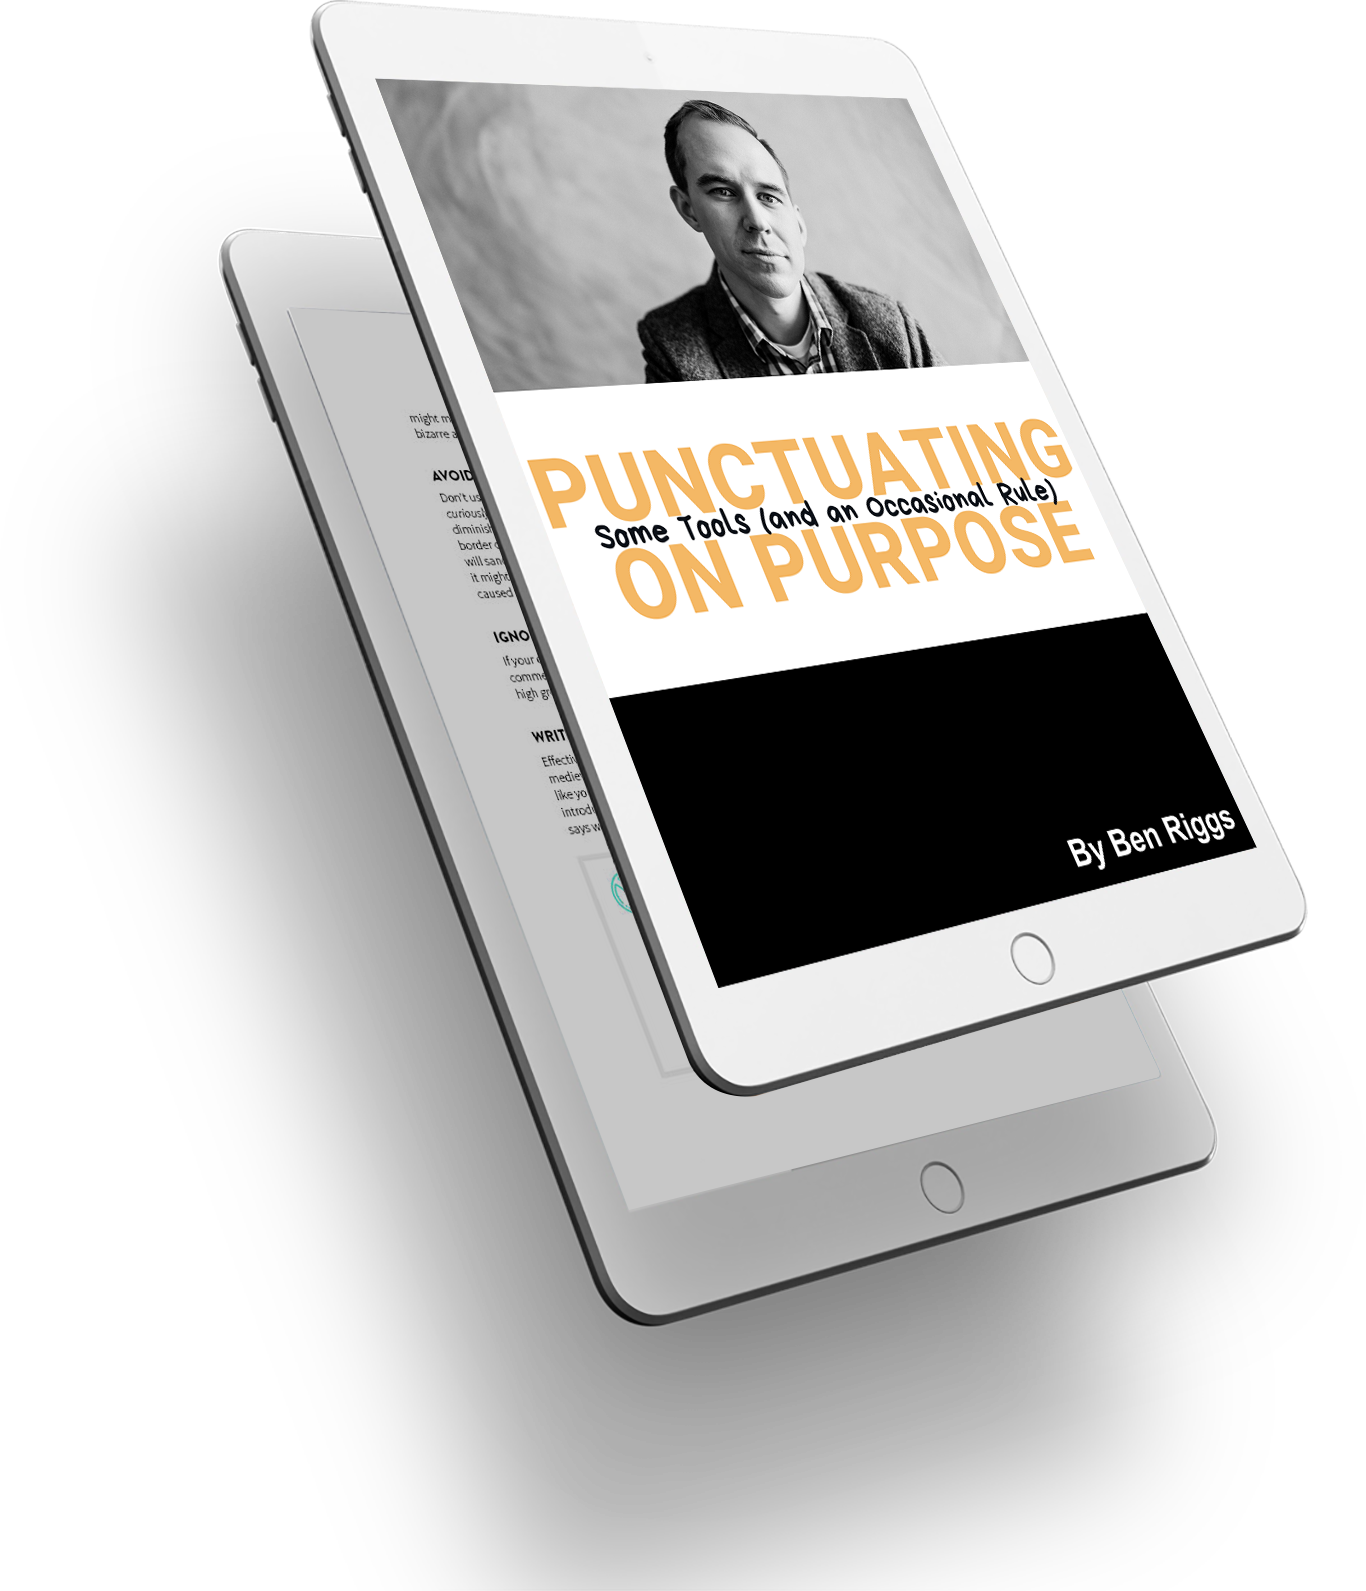 Punctuating on Purpose